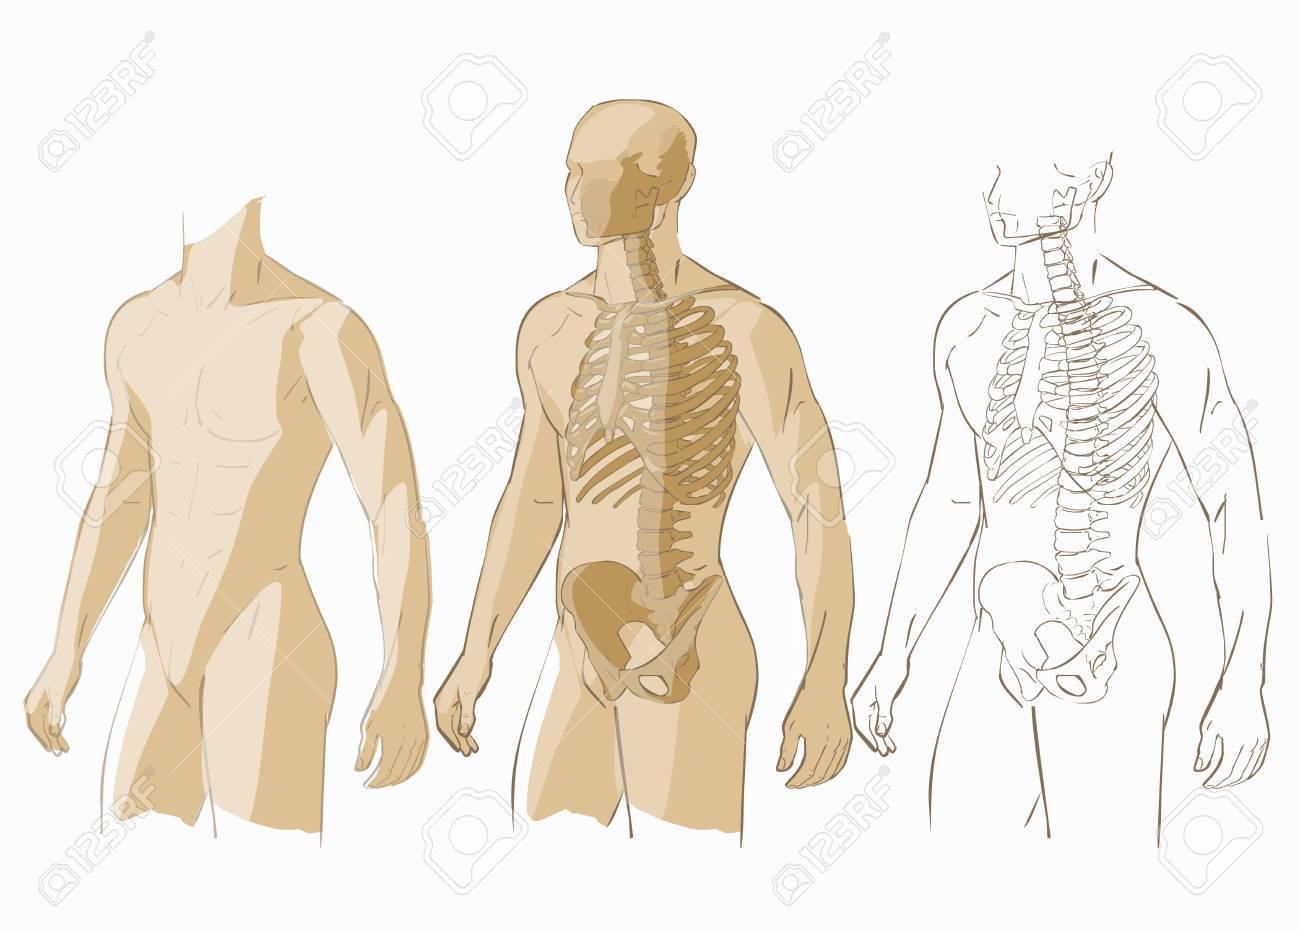 Anatomie Corps Humain Homme parties du corps humain homme squelette anatomie illustration isolé